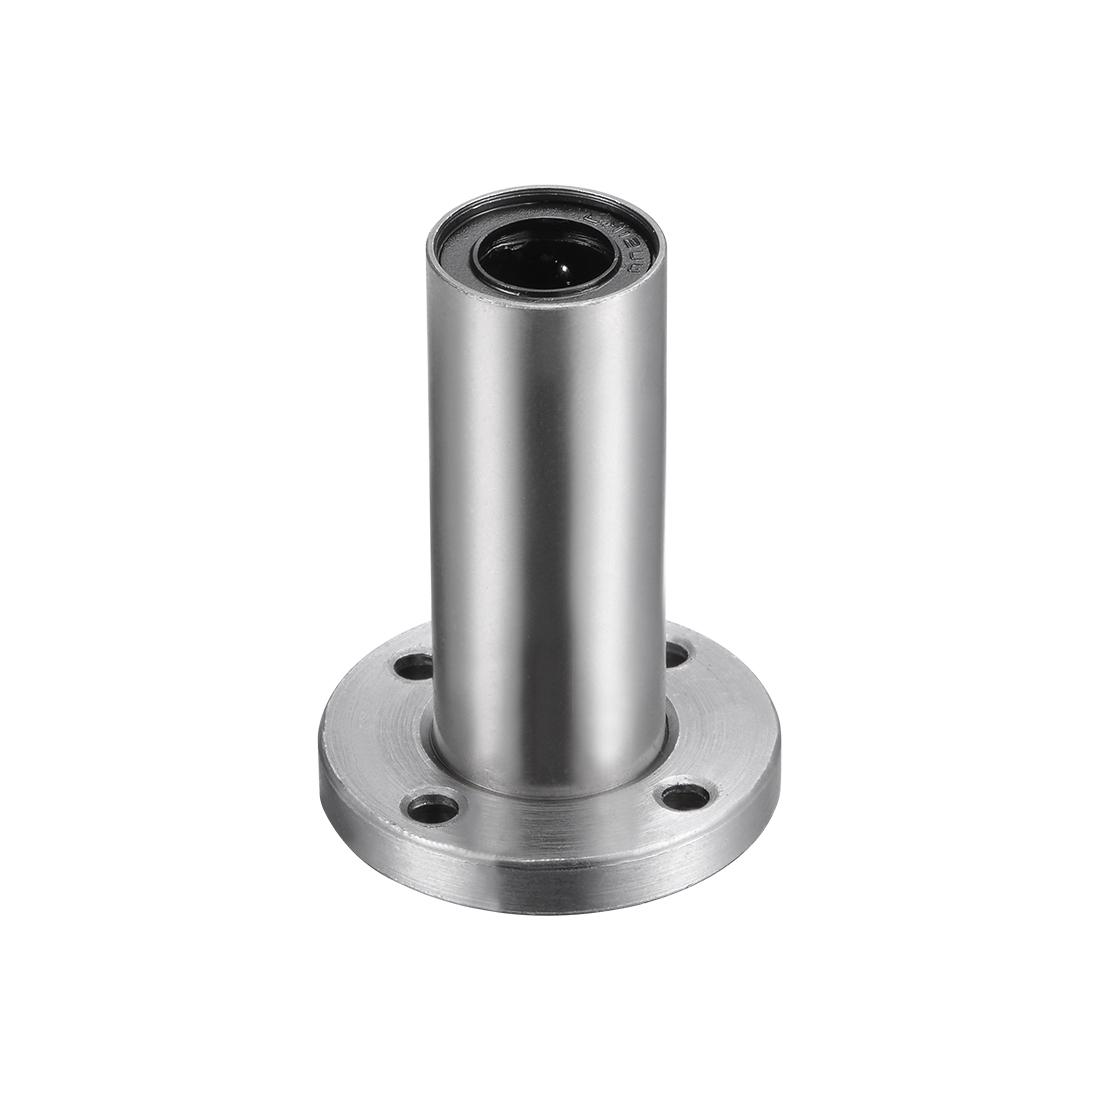 12mm Linear Ball Bearings Round Flange LMF12LUU, 12mm Bore, 21mm OD, 57mm Length